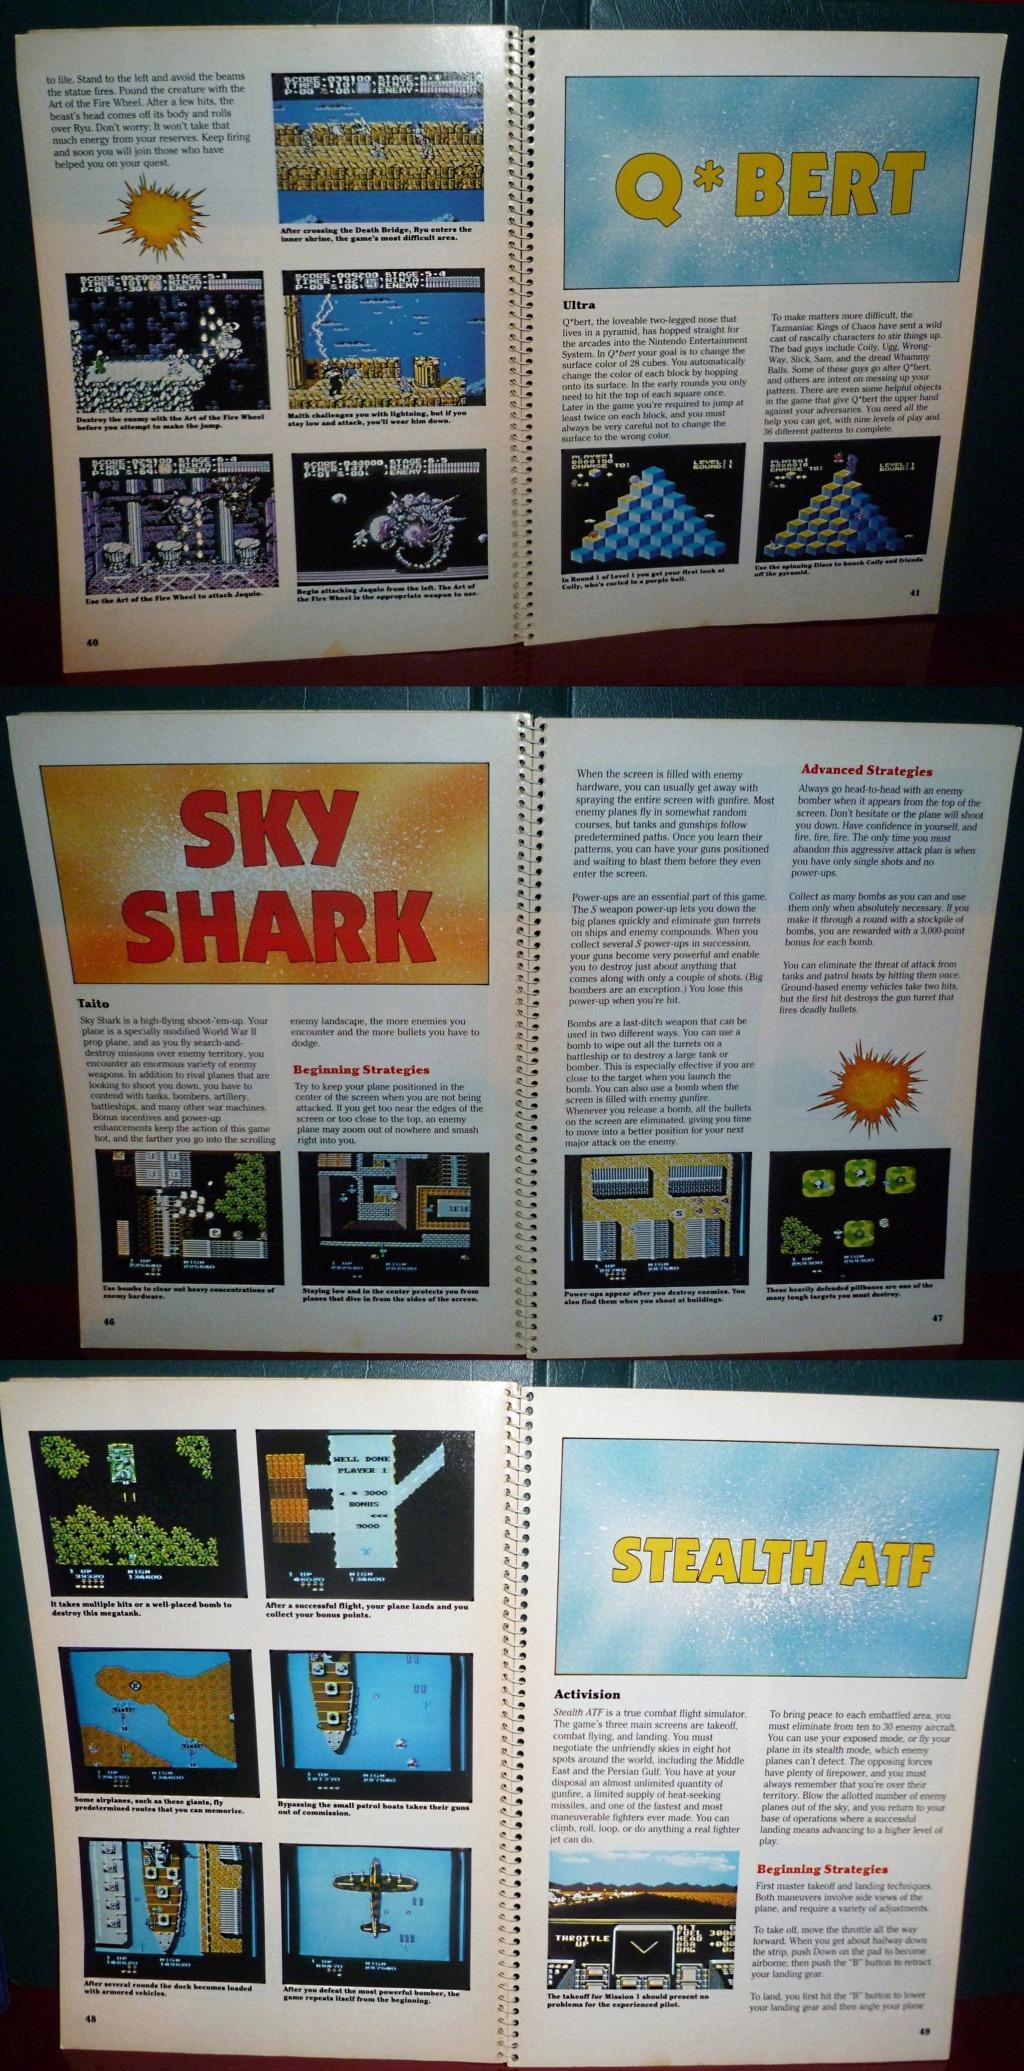 My Video Game Figures & Strategy Guides: Super Godzilla & Predator Games! Book_410